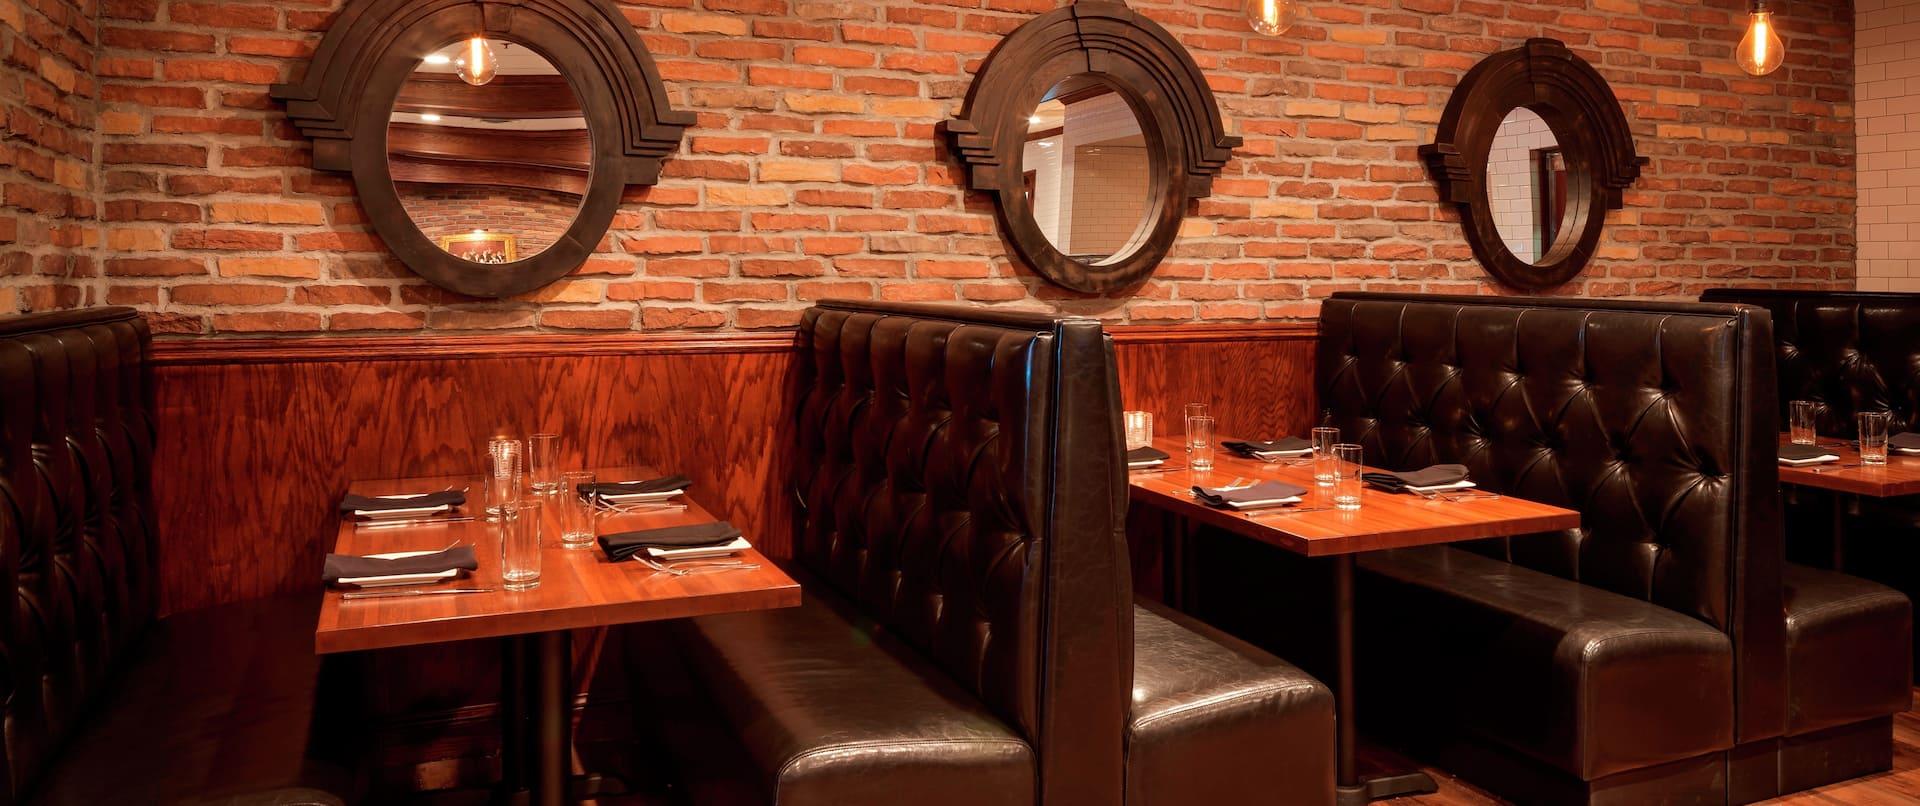 AXELS Restaurant